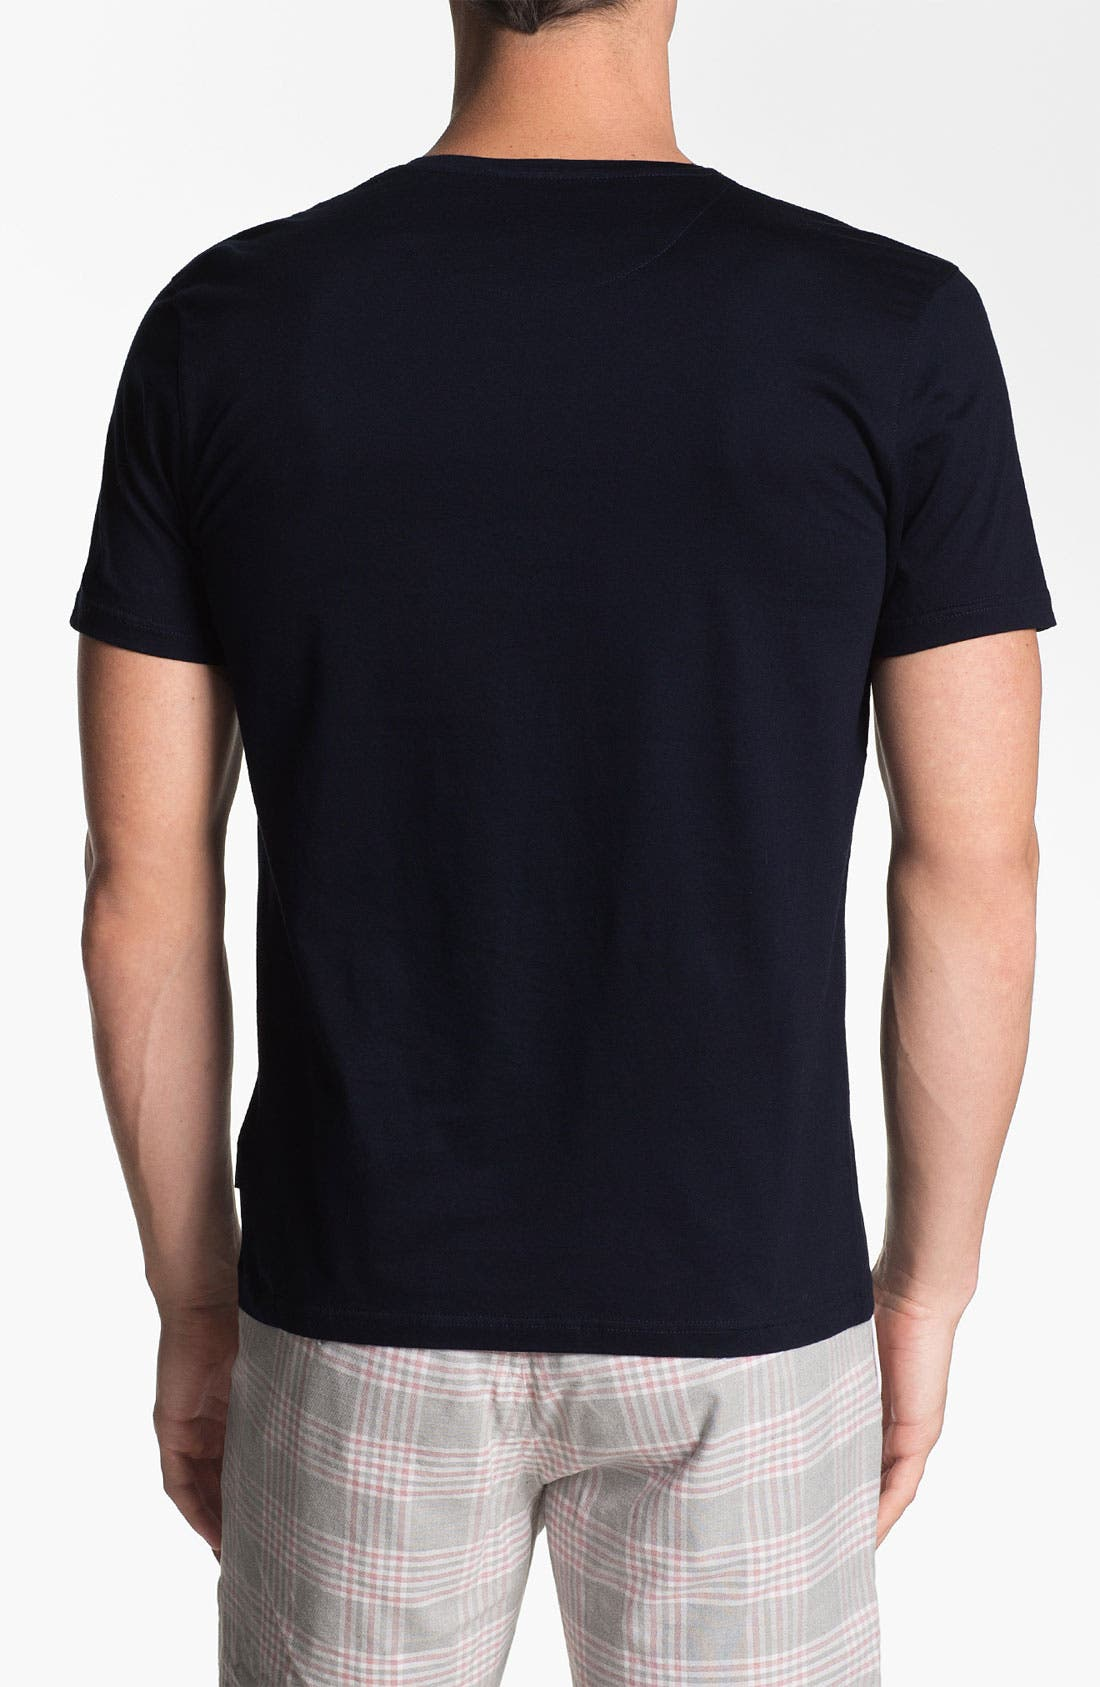 Alternate Image 2  - Ted Baker London 'Mezsure' Pocket T-Shirt